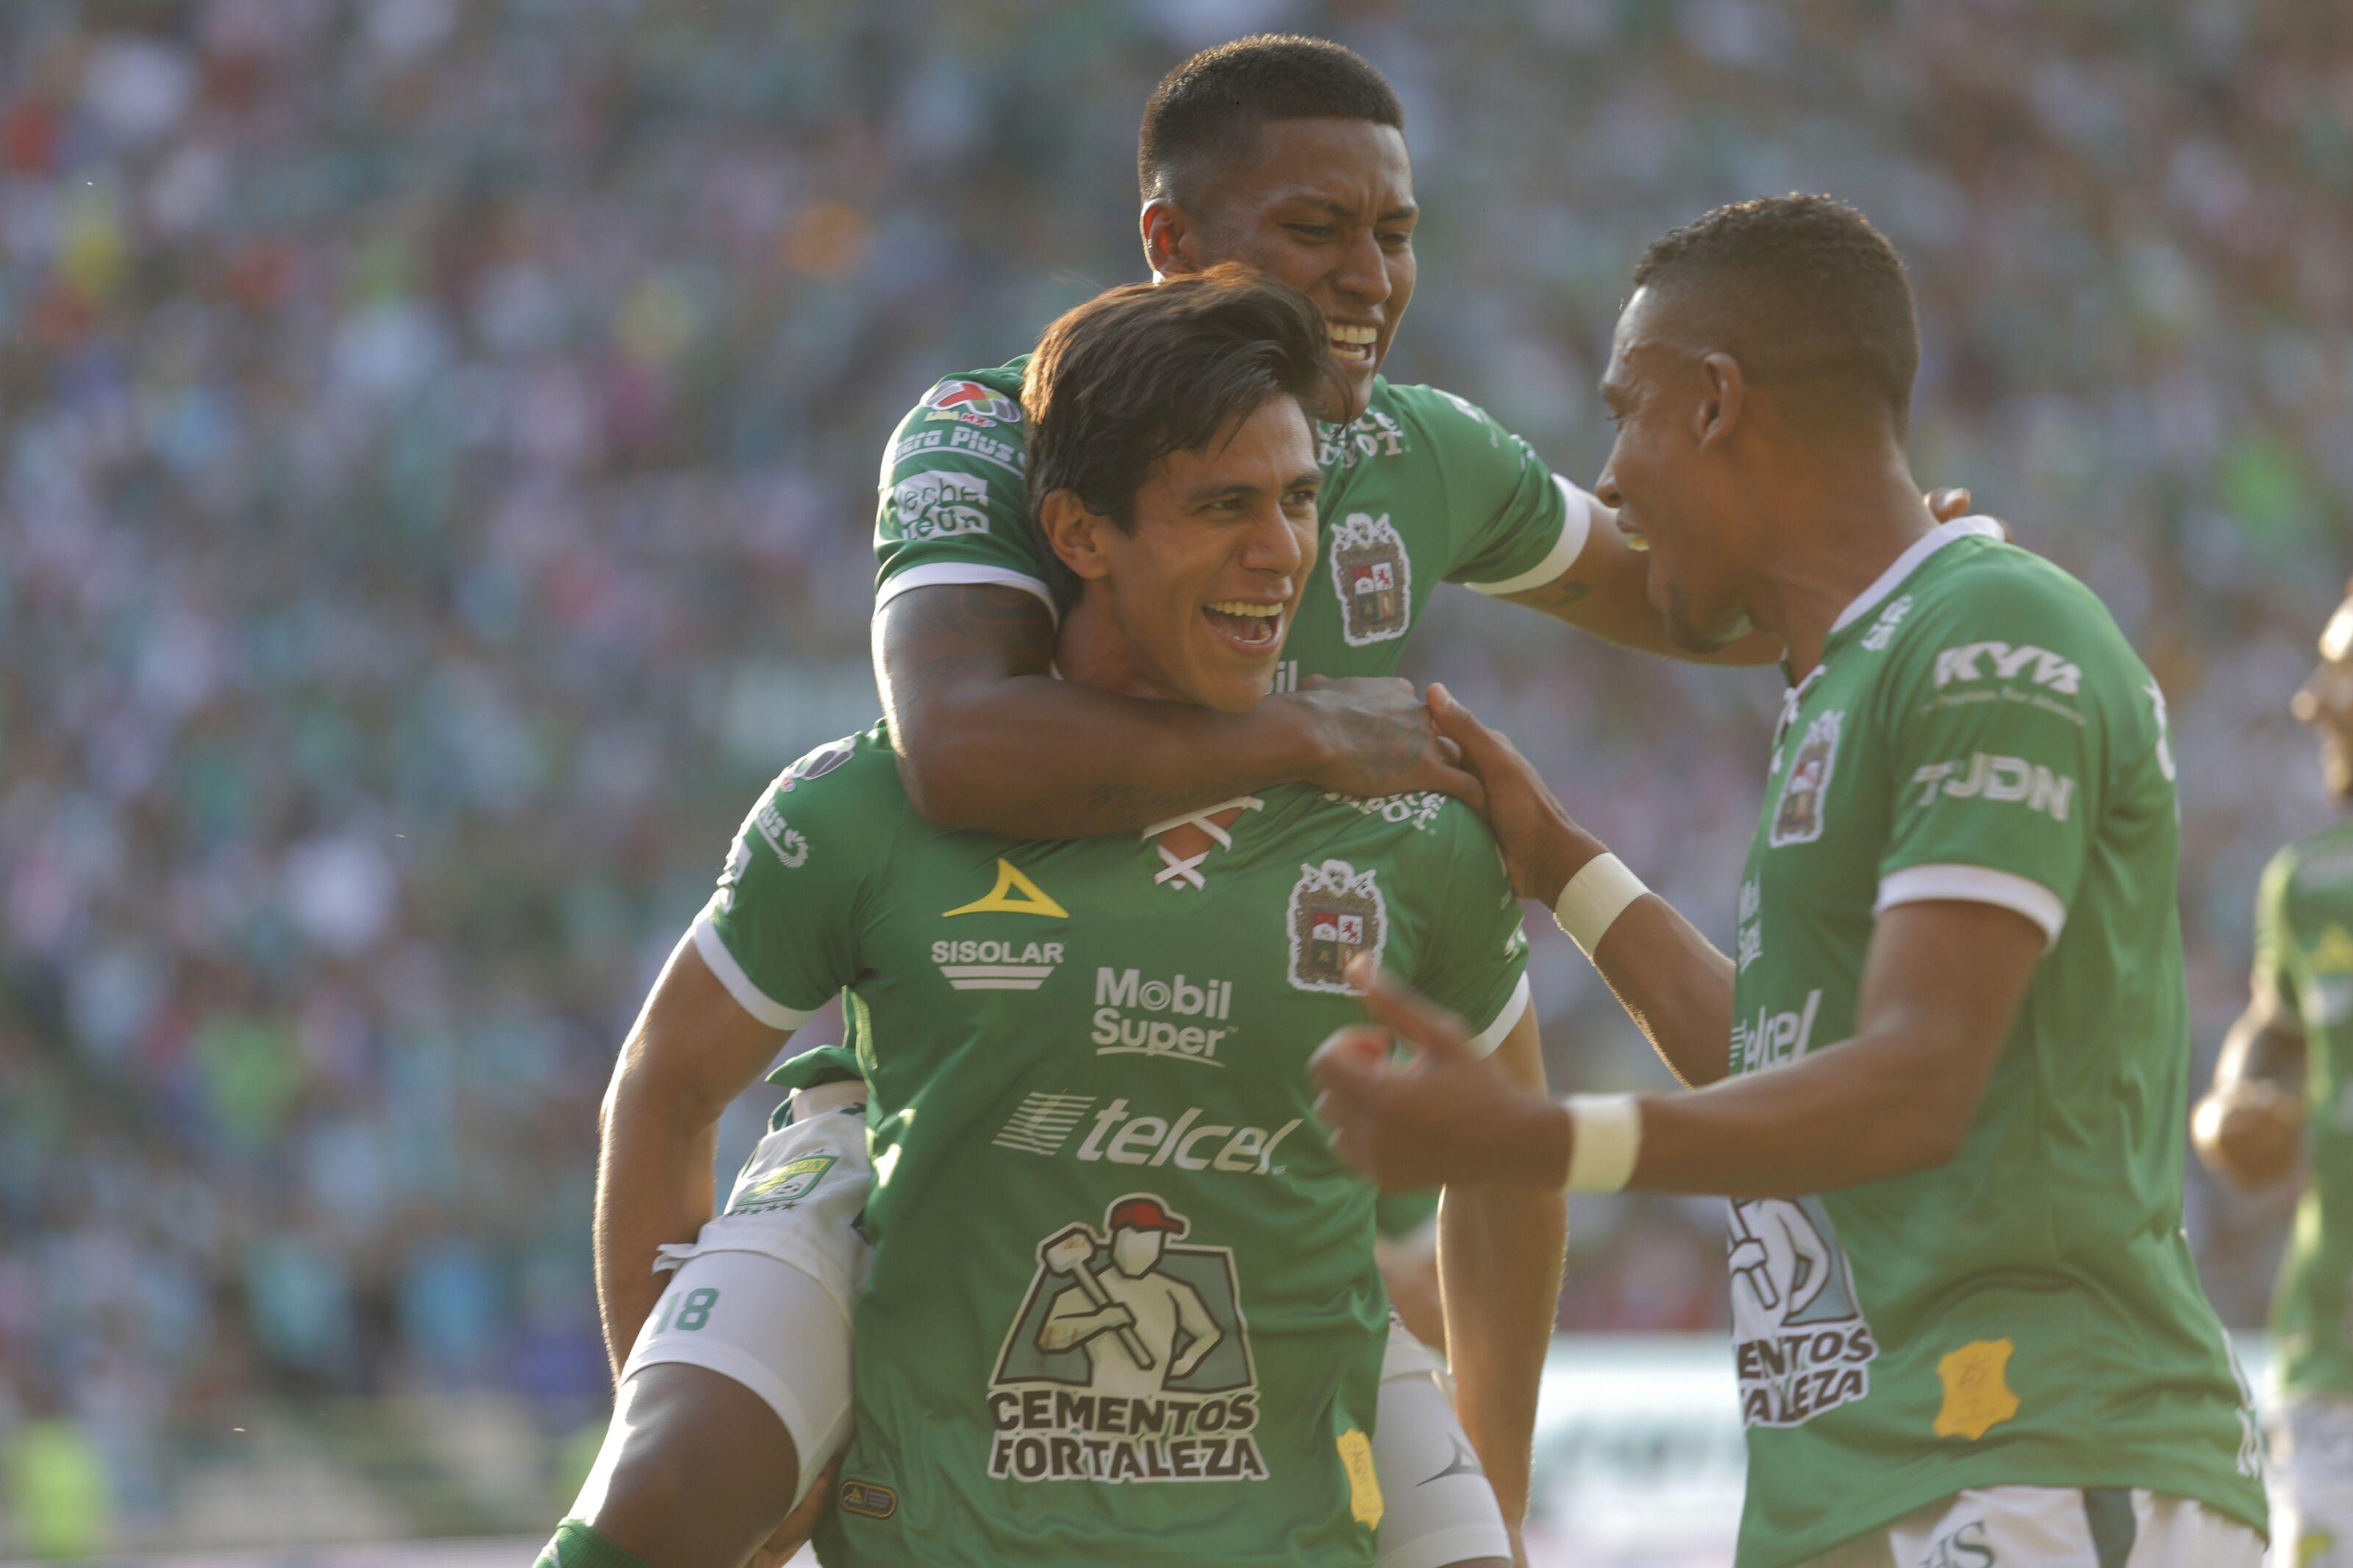 Leon survives frantic comeback by visiting Chivas, win 4-3